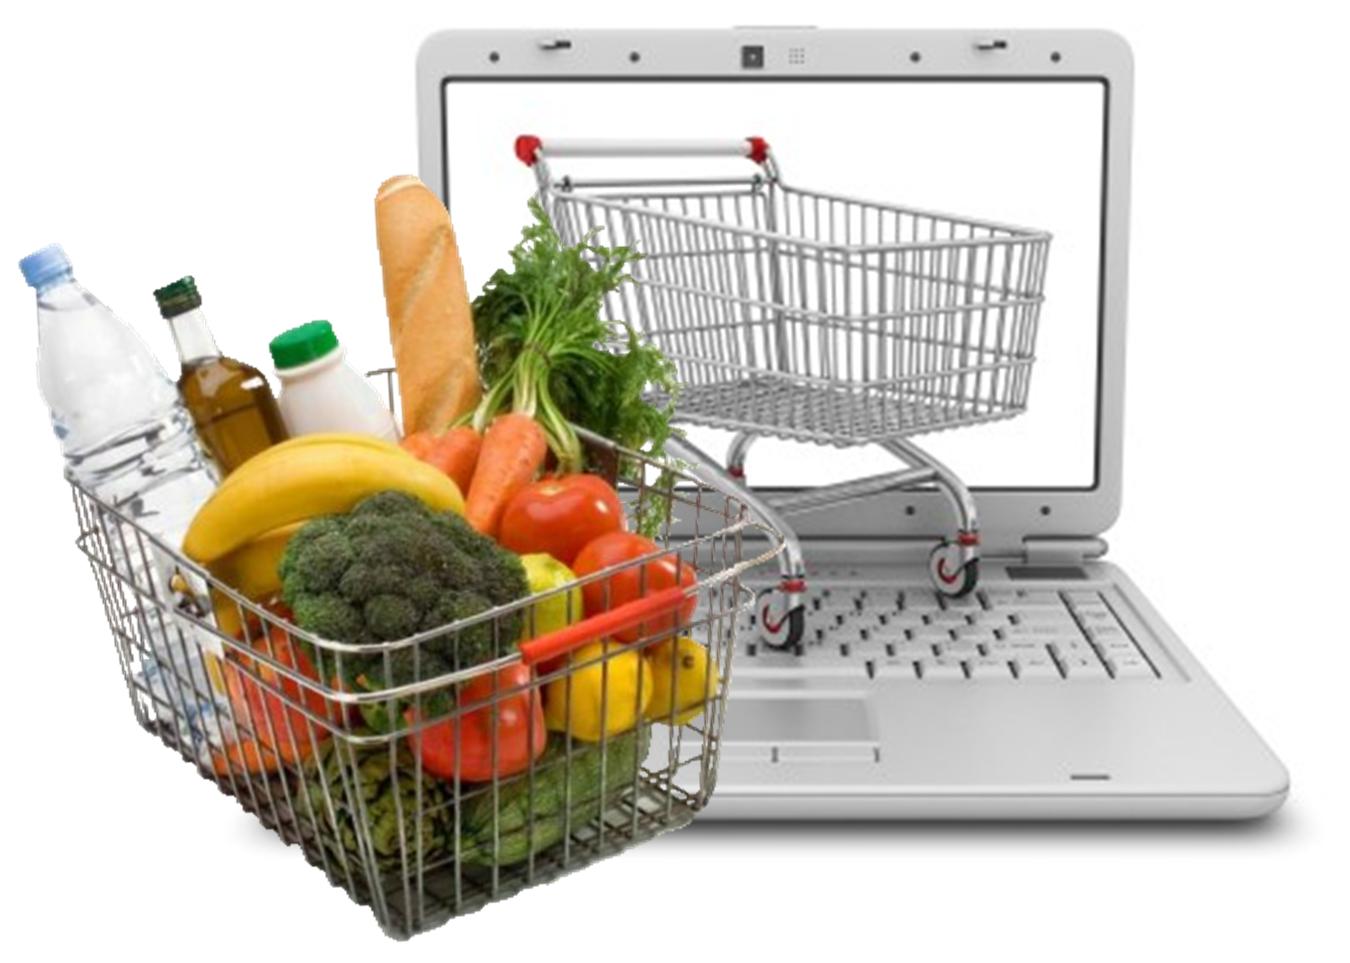 Kinh doanh món ăn online